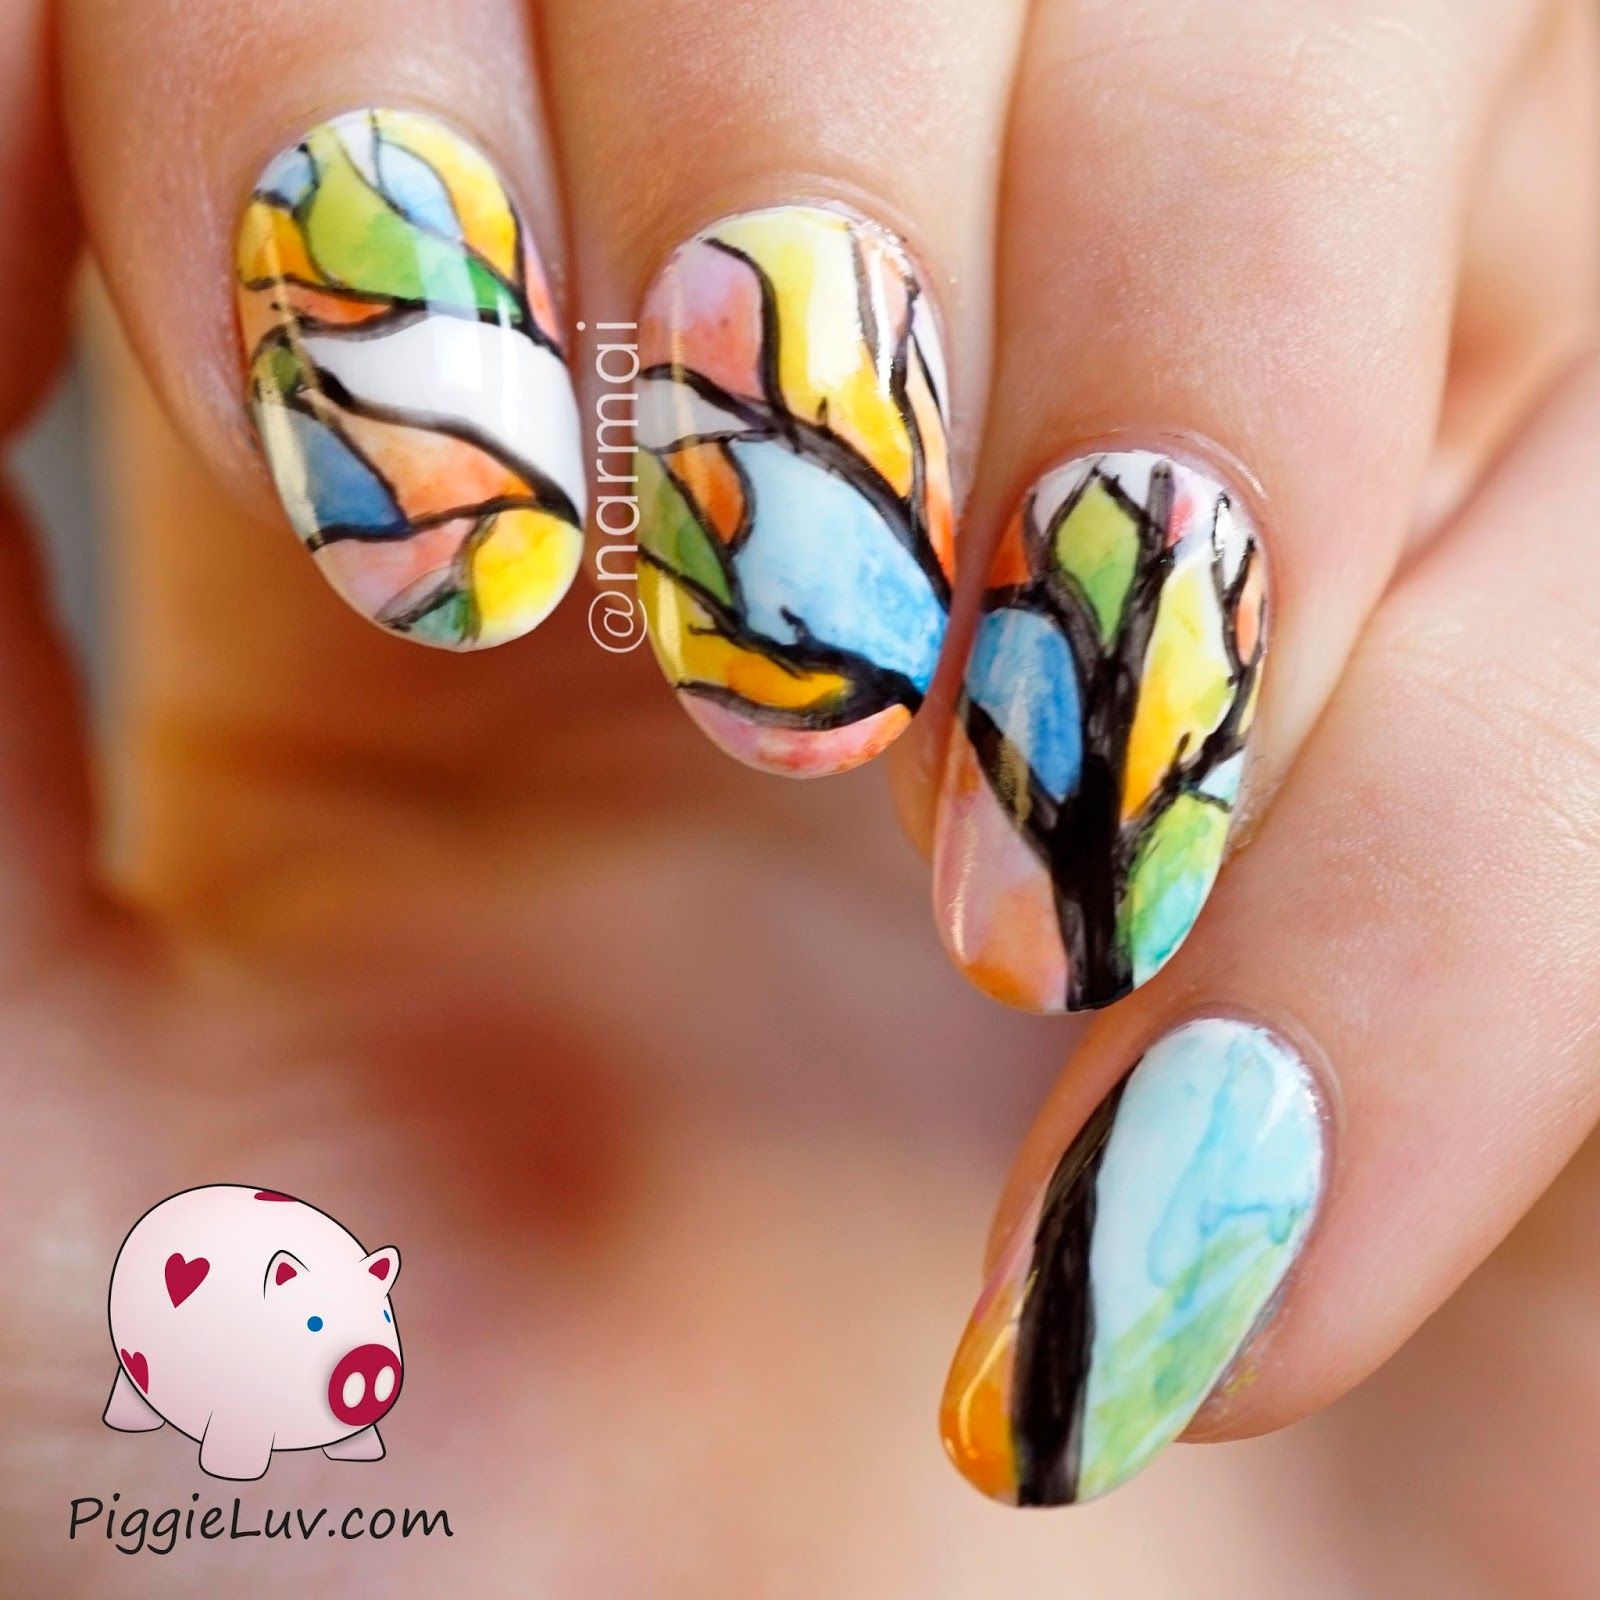 PiggieLuv: Aquarelle tree nail art